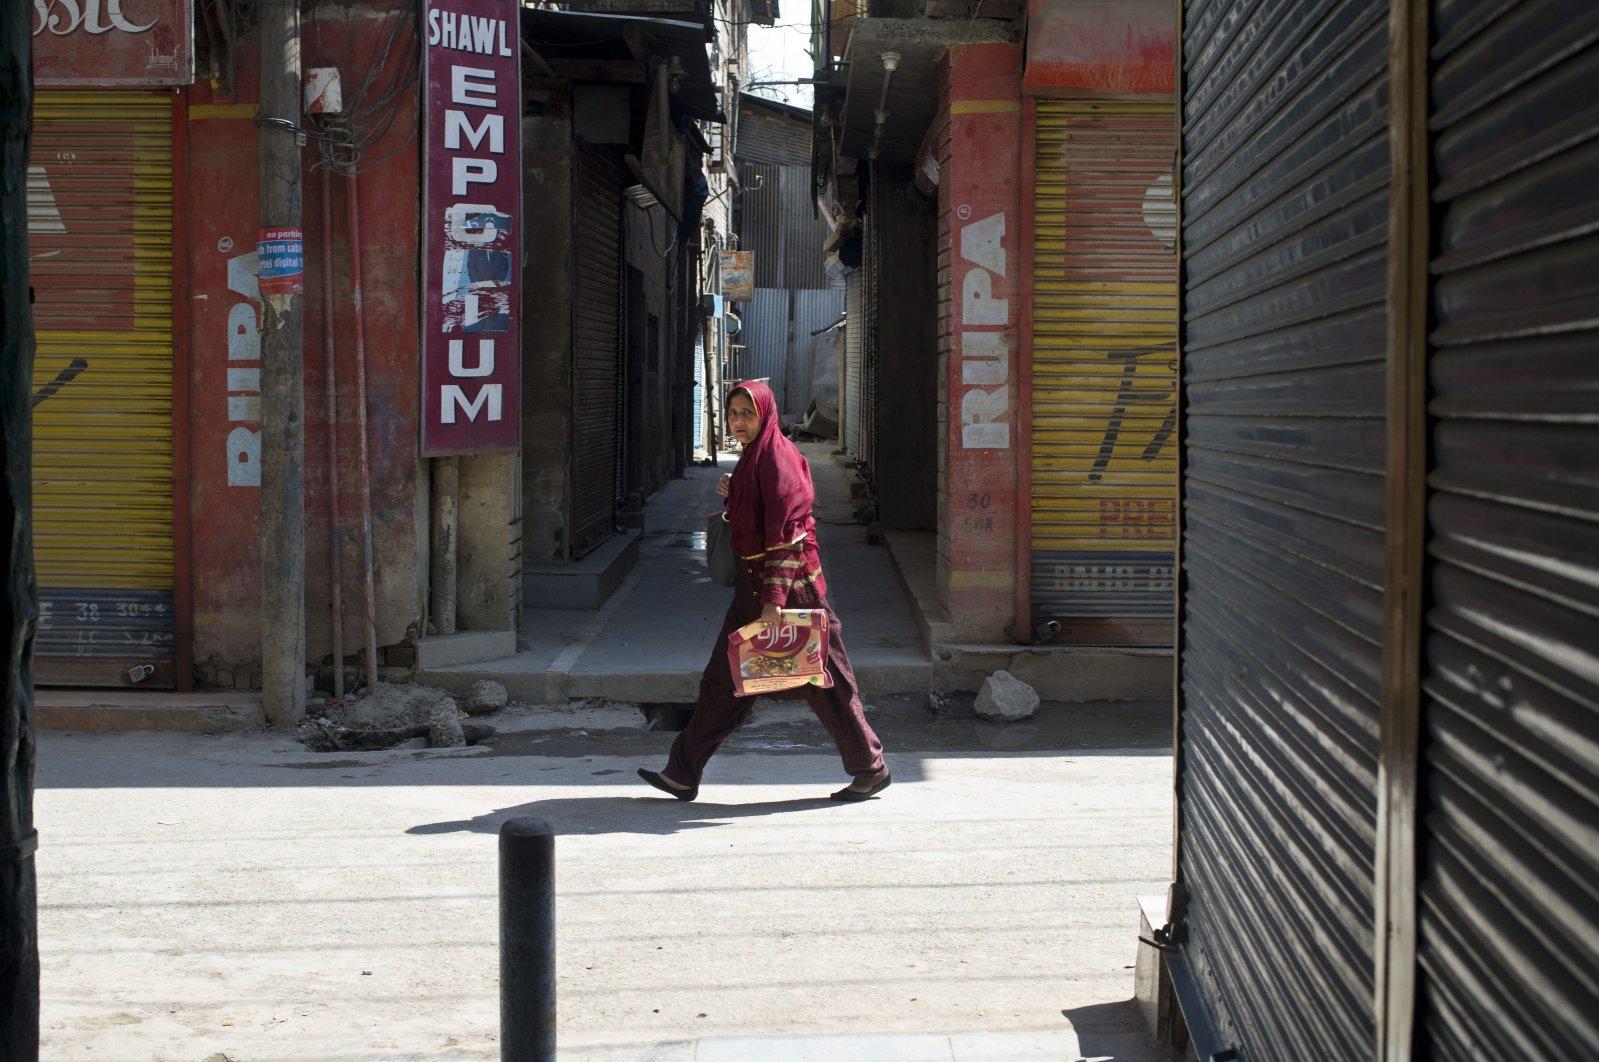 A Kashmiri Muslim woman walks past a closed market during a strike in Srinagar, Indian-administrated Kashmir, India, April 11, 2015. (AP Photo)